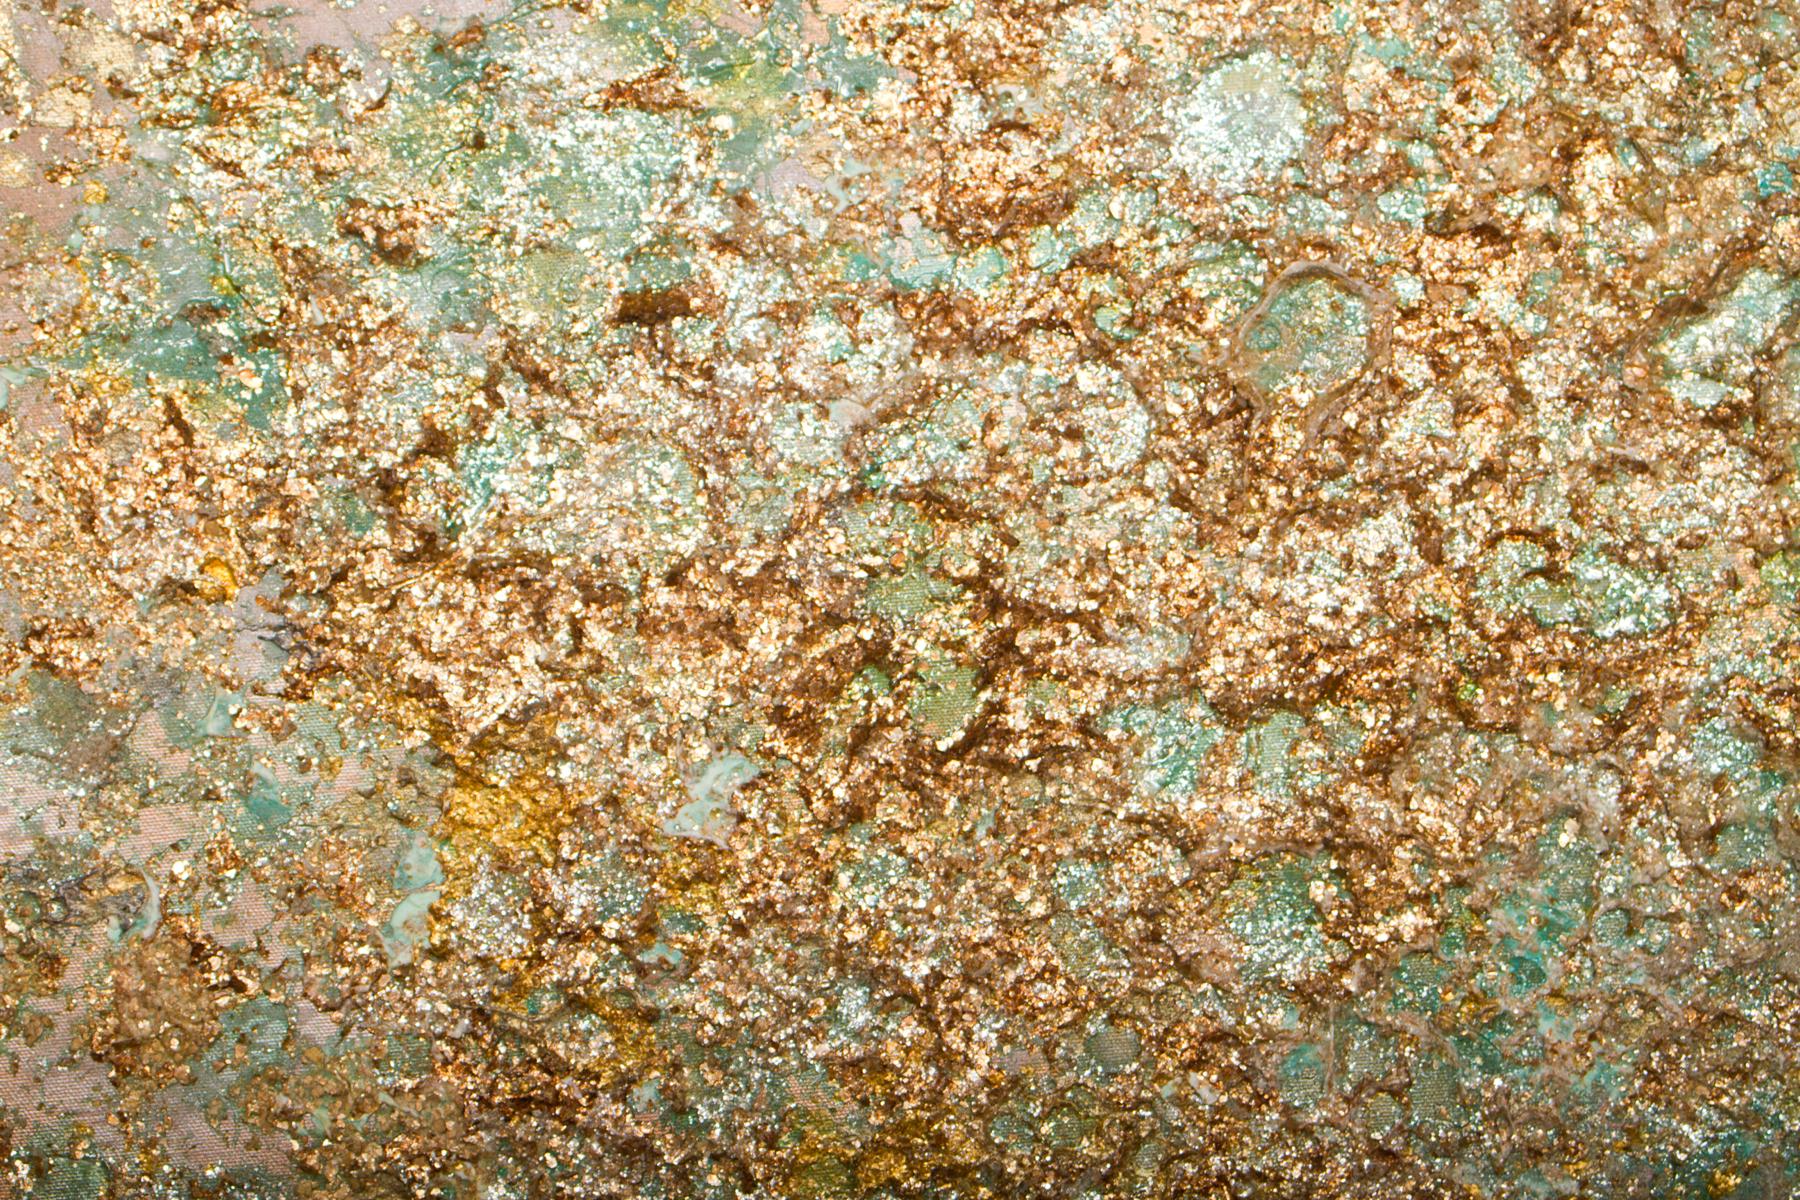 Detail of Seafoam Gold